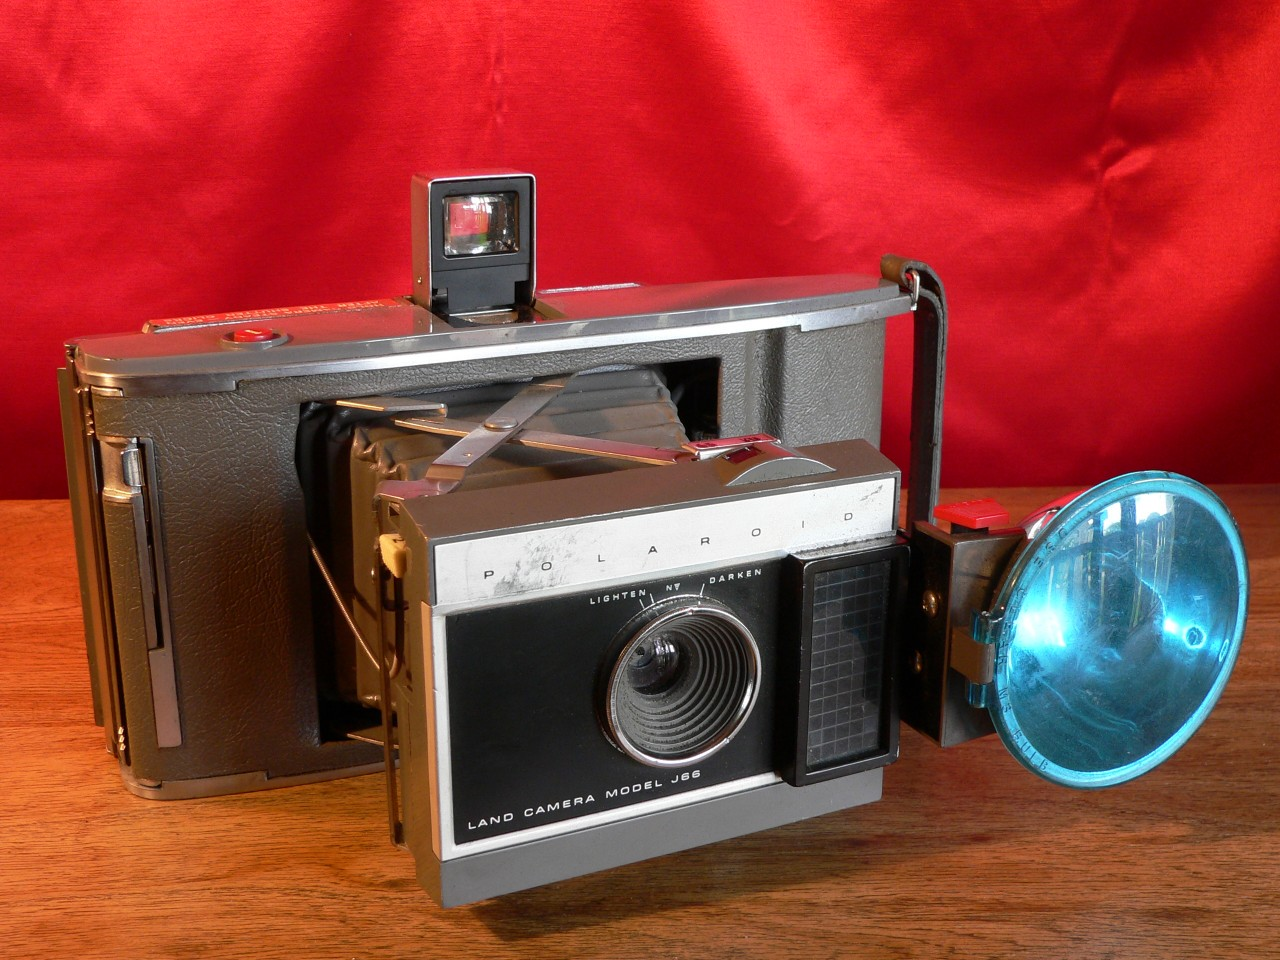 Polaroid Land Camera Model J-66  (1961-1966)